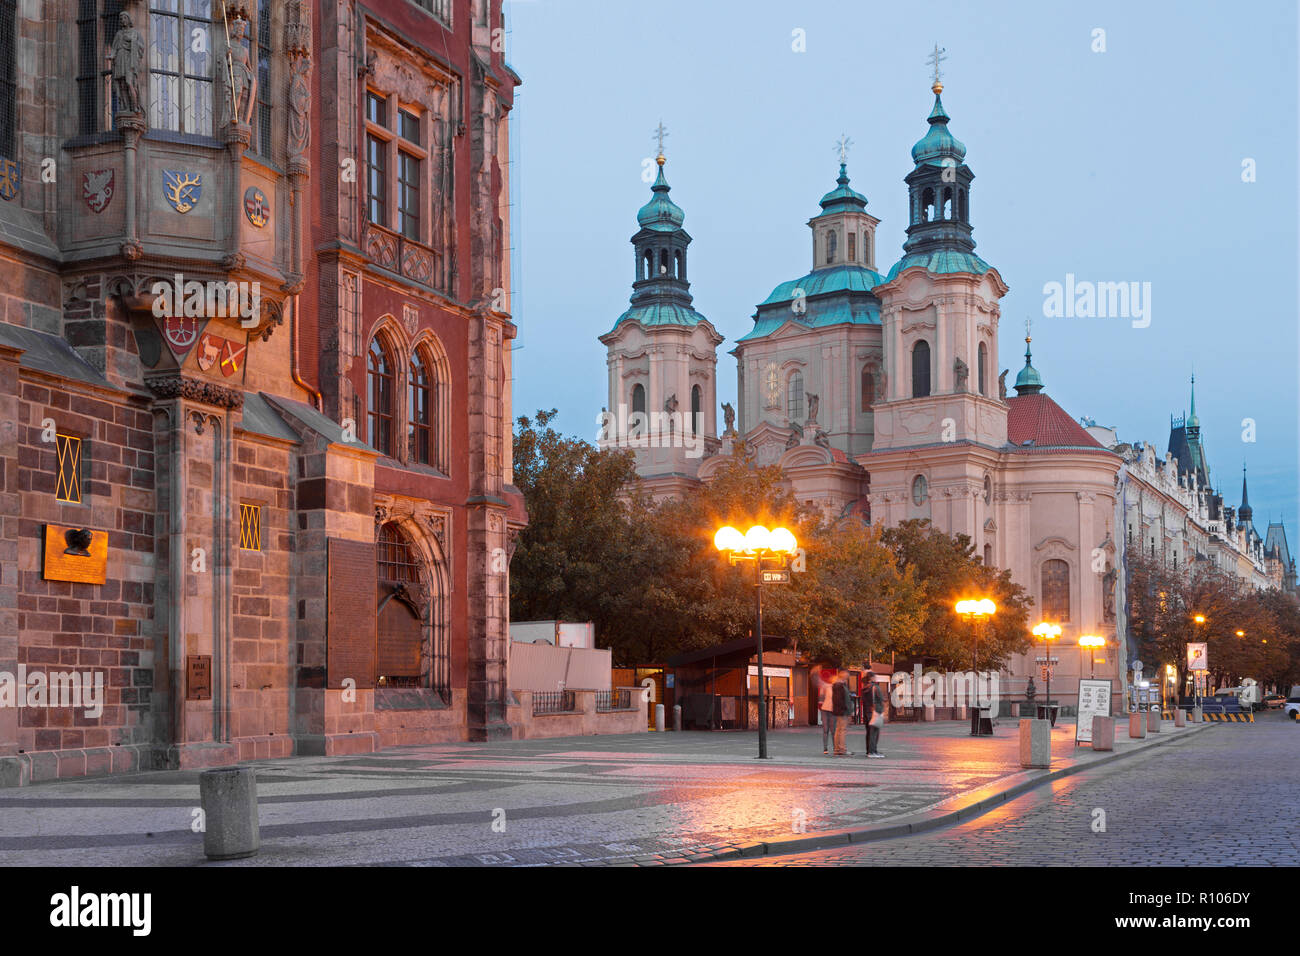 Prague - The Old Town hall, Orloj, Staromestske square and St. Nicholas church at dusk. - Stock Image